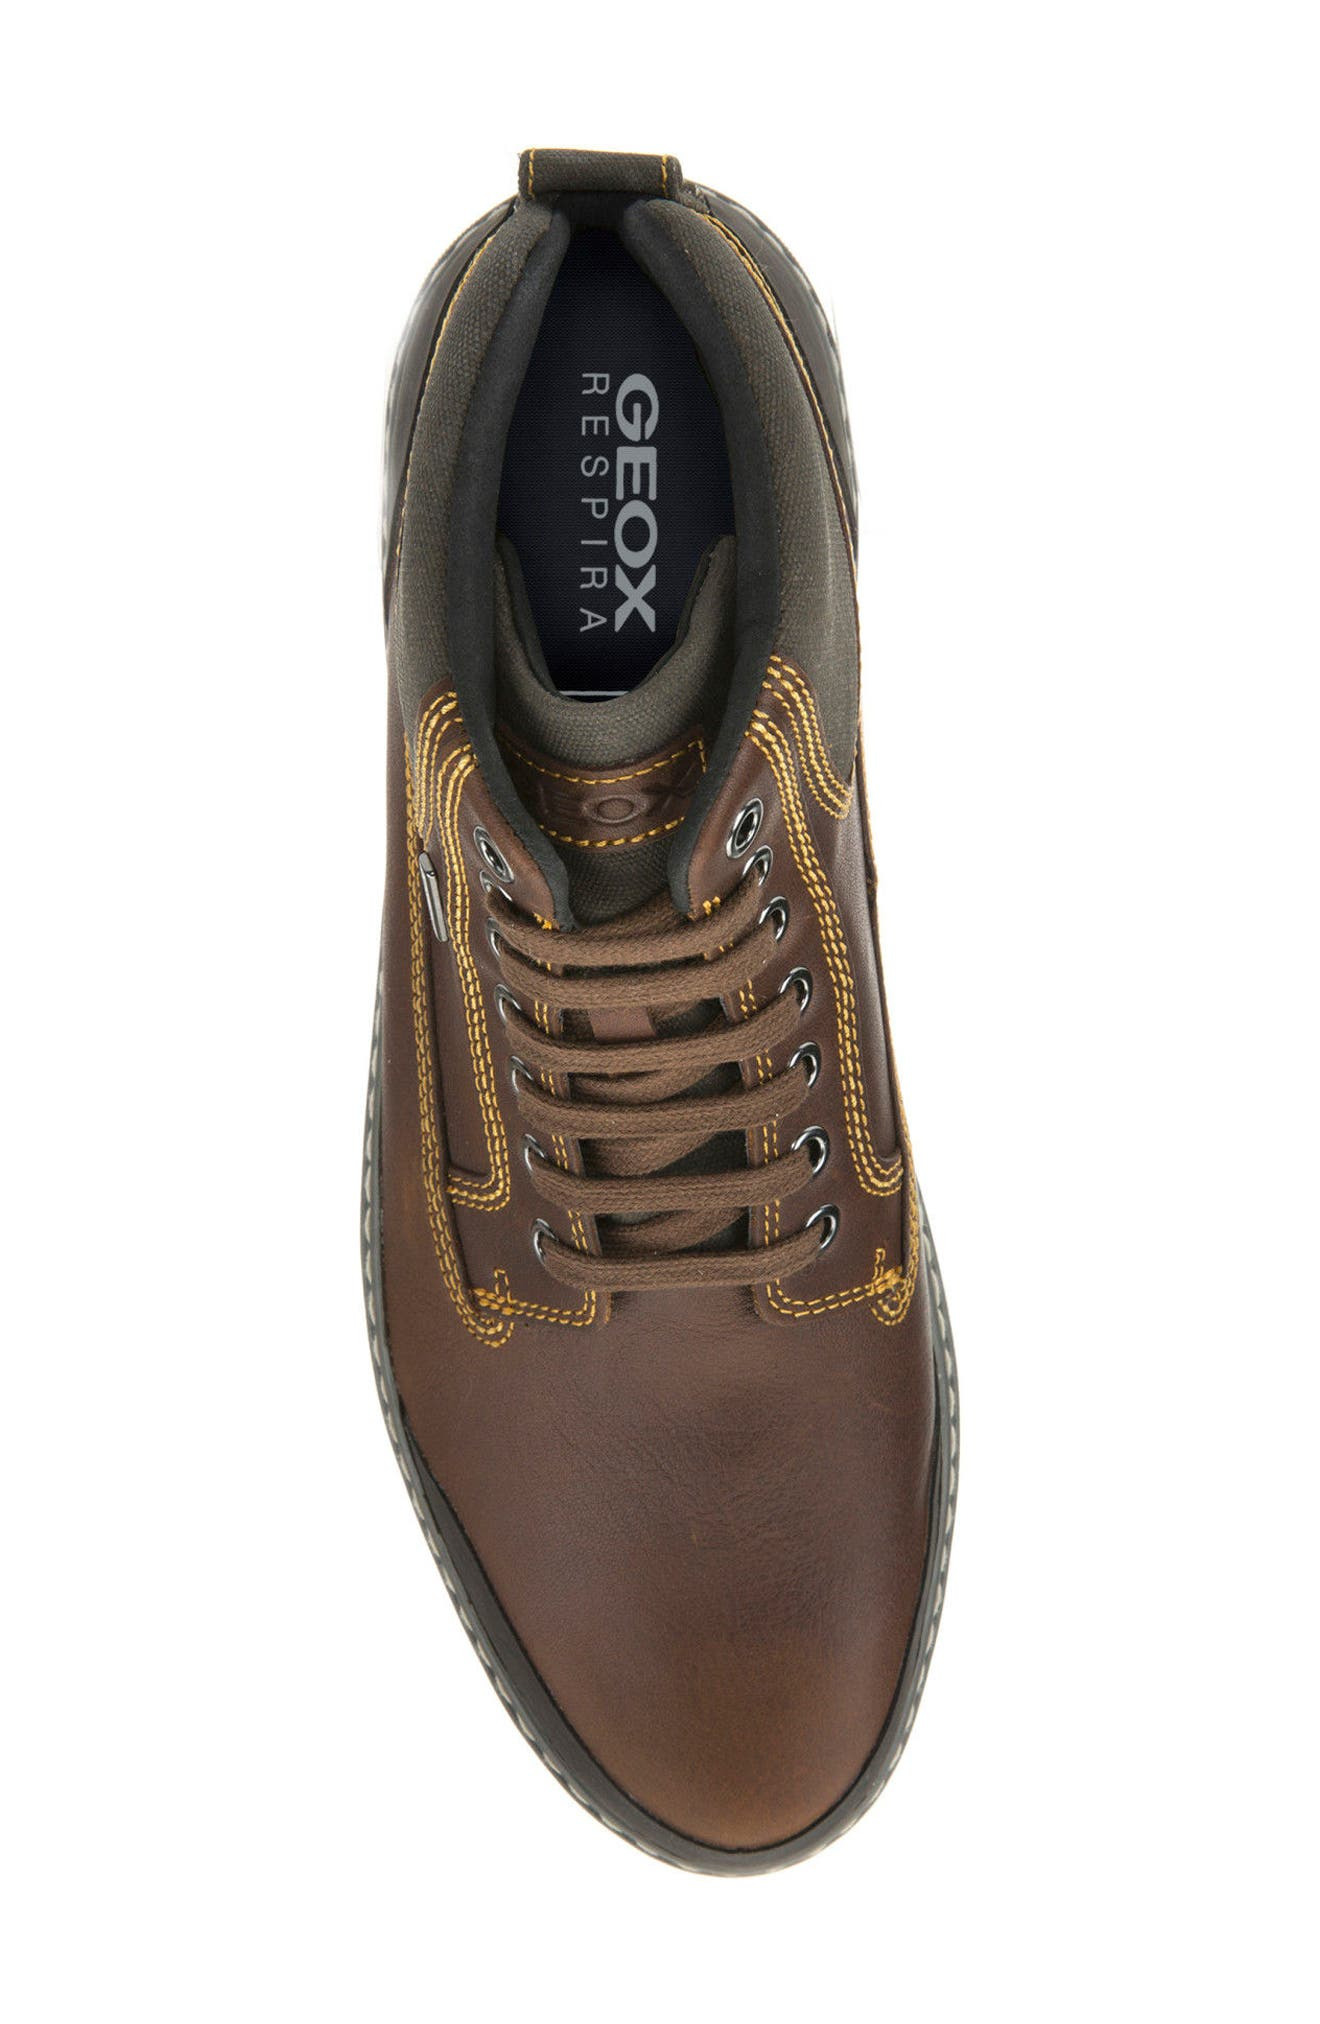 Mattias Amphibiox Waterproof Leather Sneaker,                             Alternate thumbnail 5, color,                             204